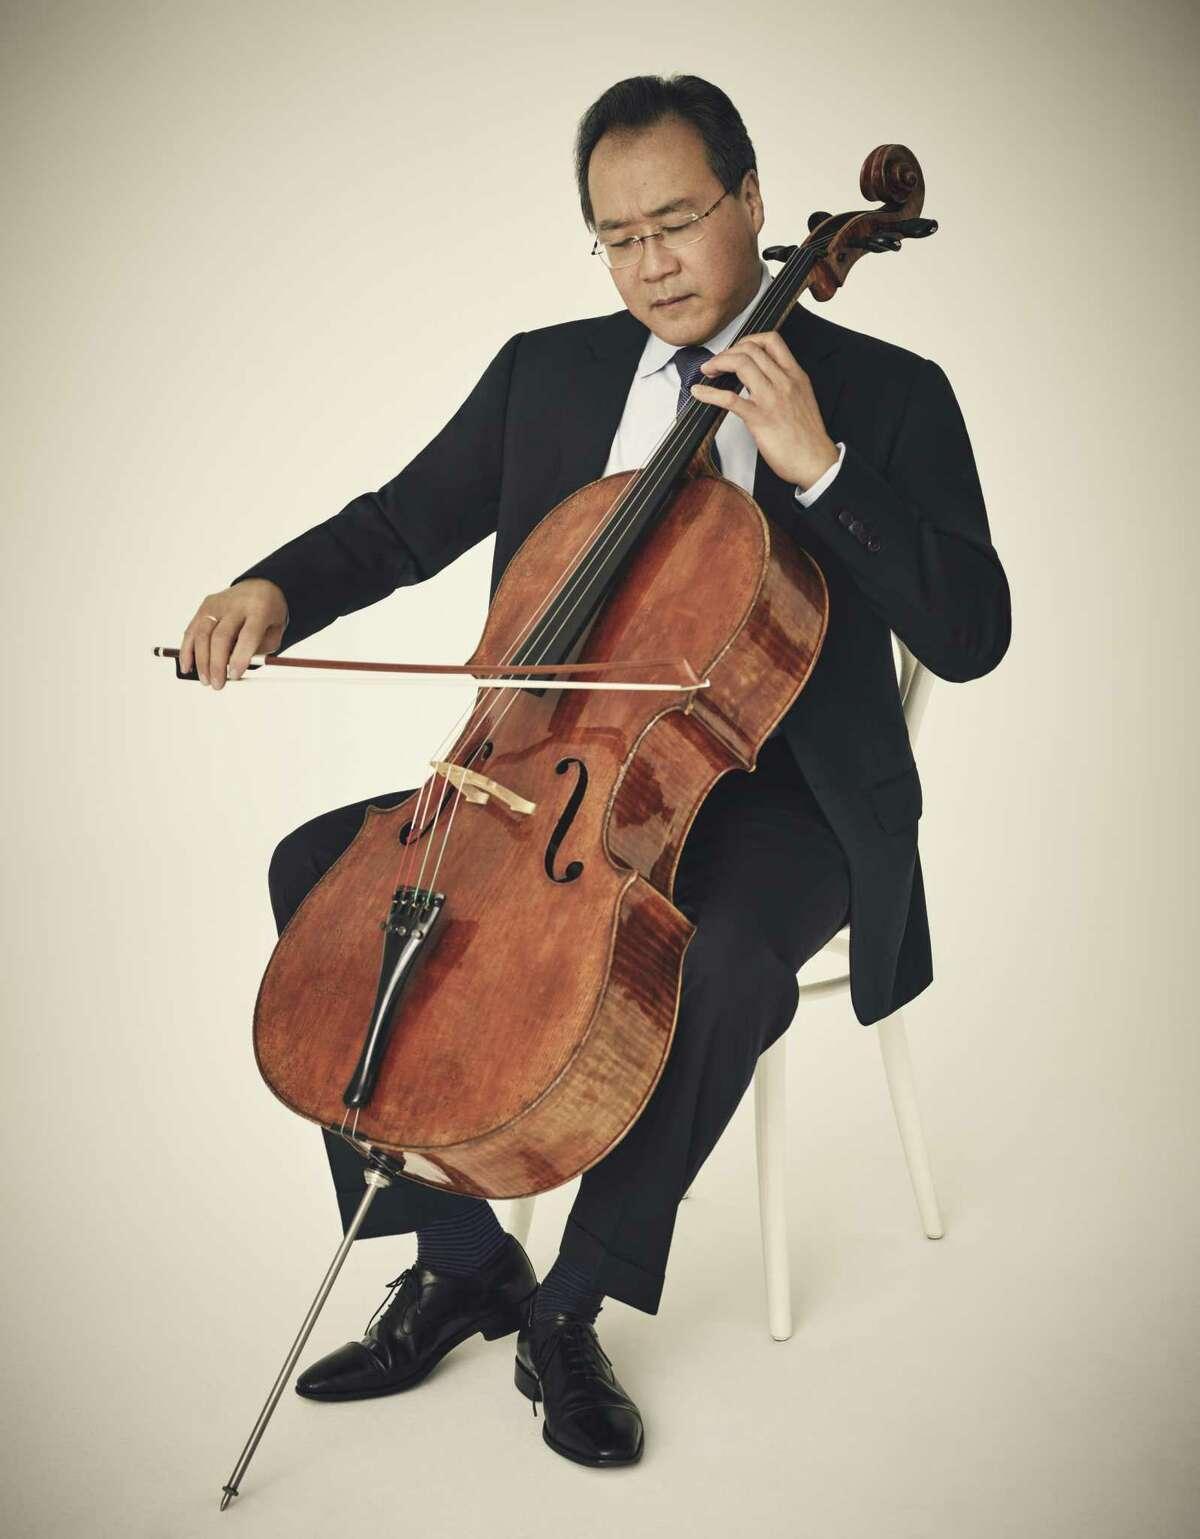 Cellist Yo-Yo Ma will perform at Laurie Auditorium in April, courtesy of Arts San Antonio.